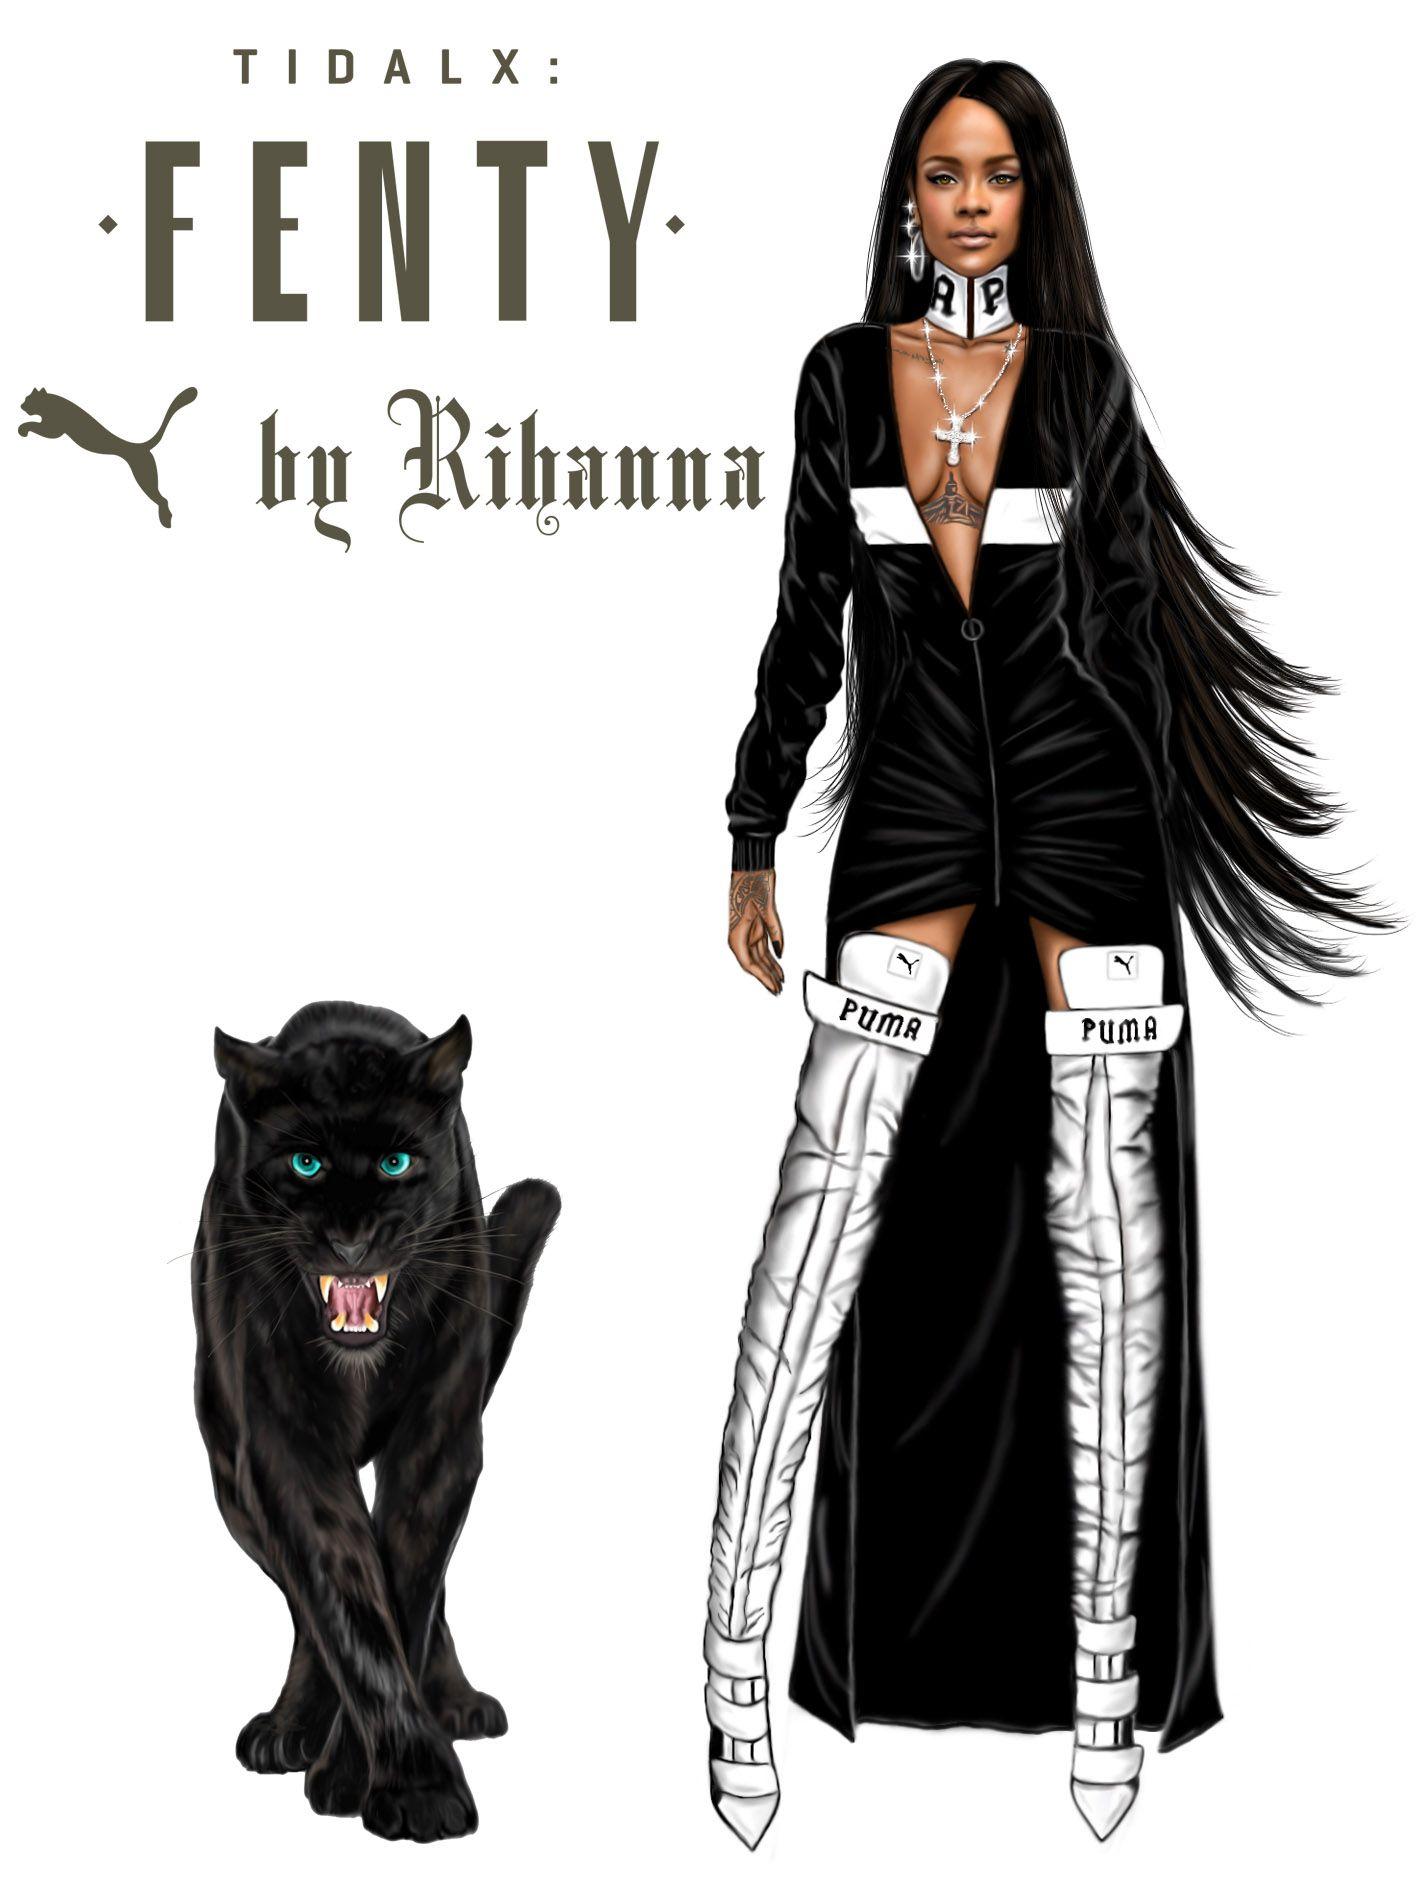 32685c2cab @Rihanna ====> Fenty X Puma collection by Rihanna to Foot Locker in New  York . #Digitaldrawing by @David Mandeiro Illustrations #Rihanna  #Badgalriri ...